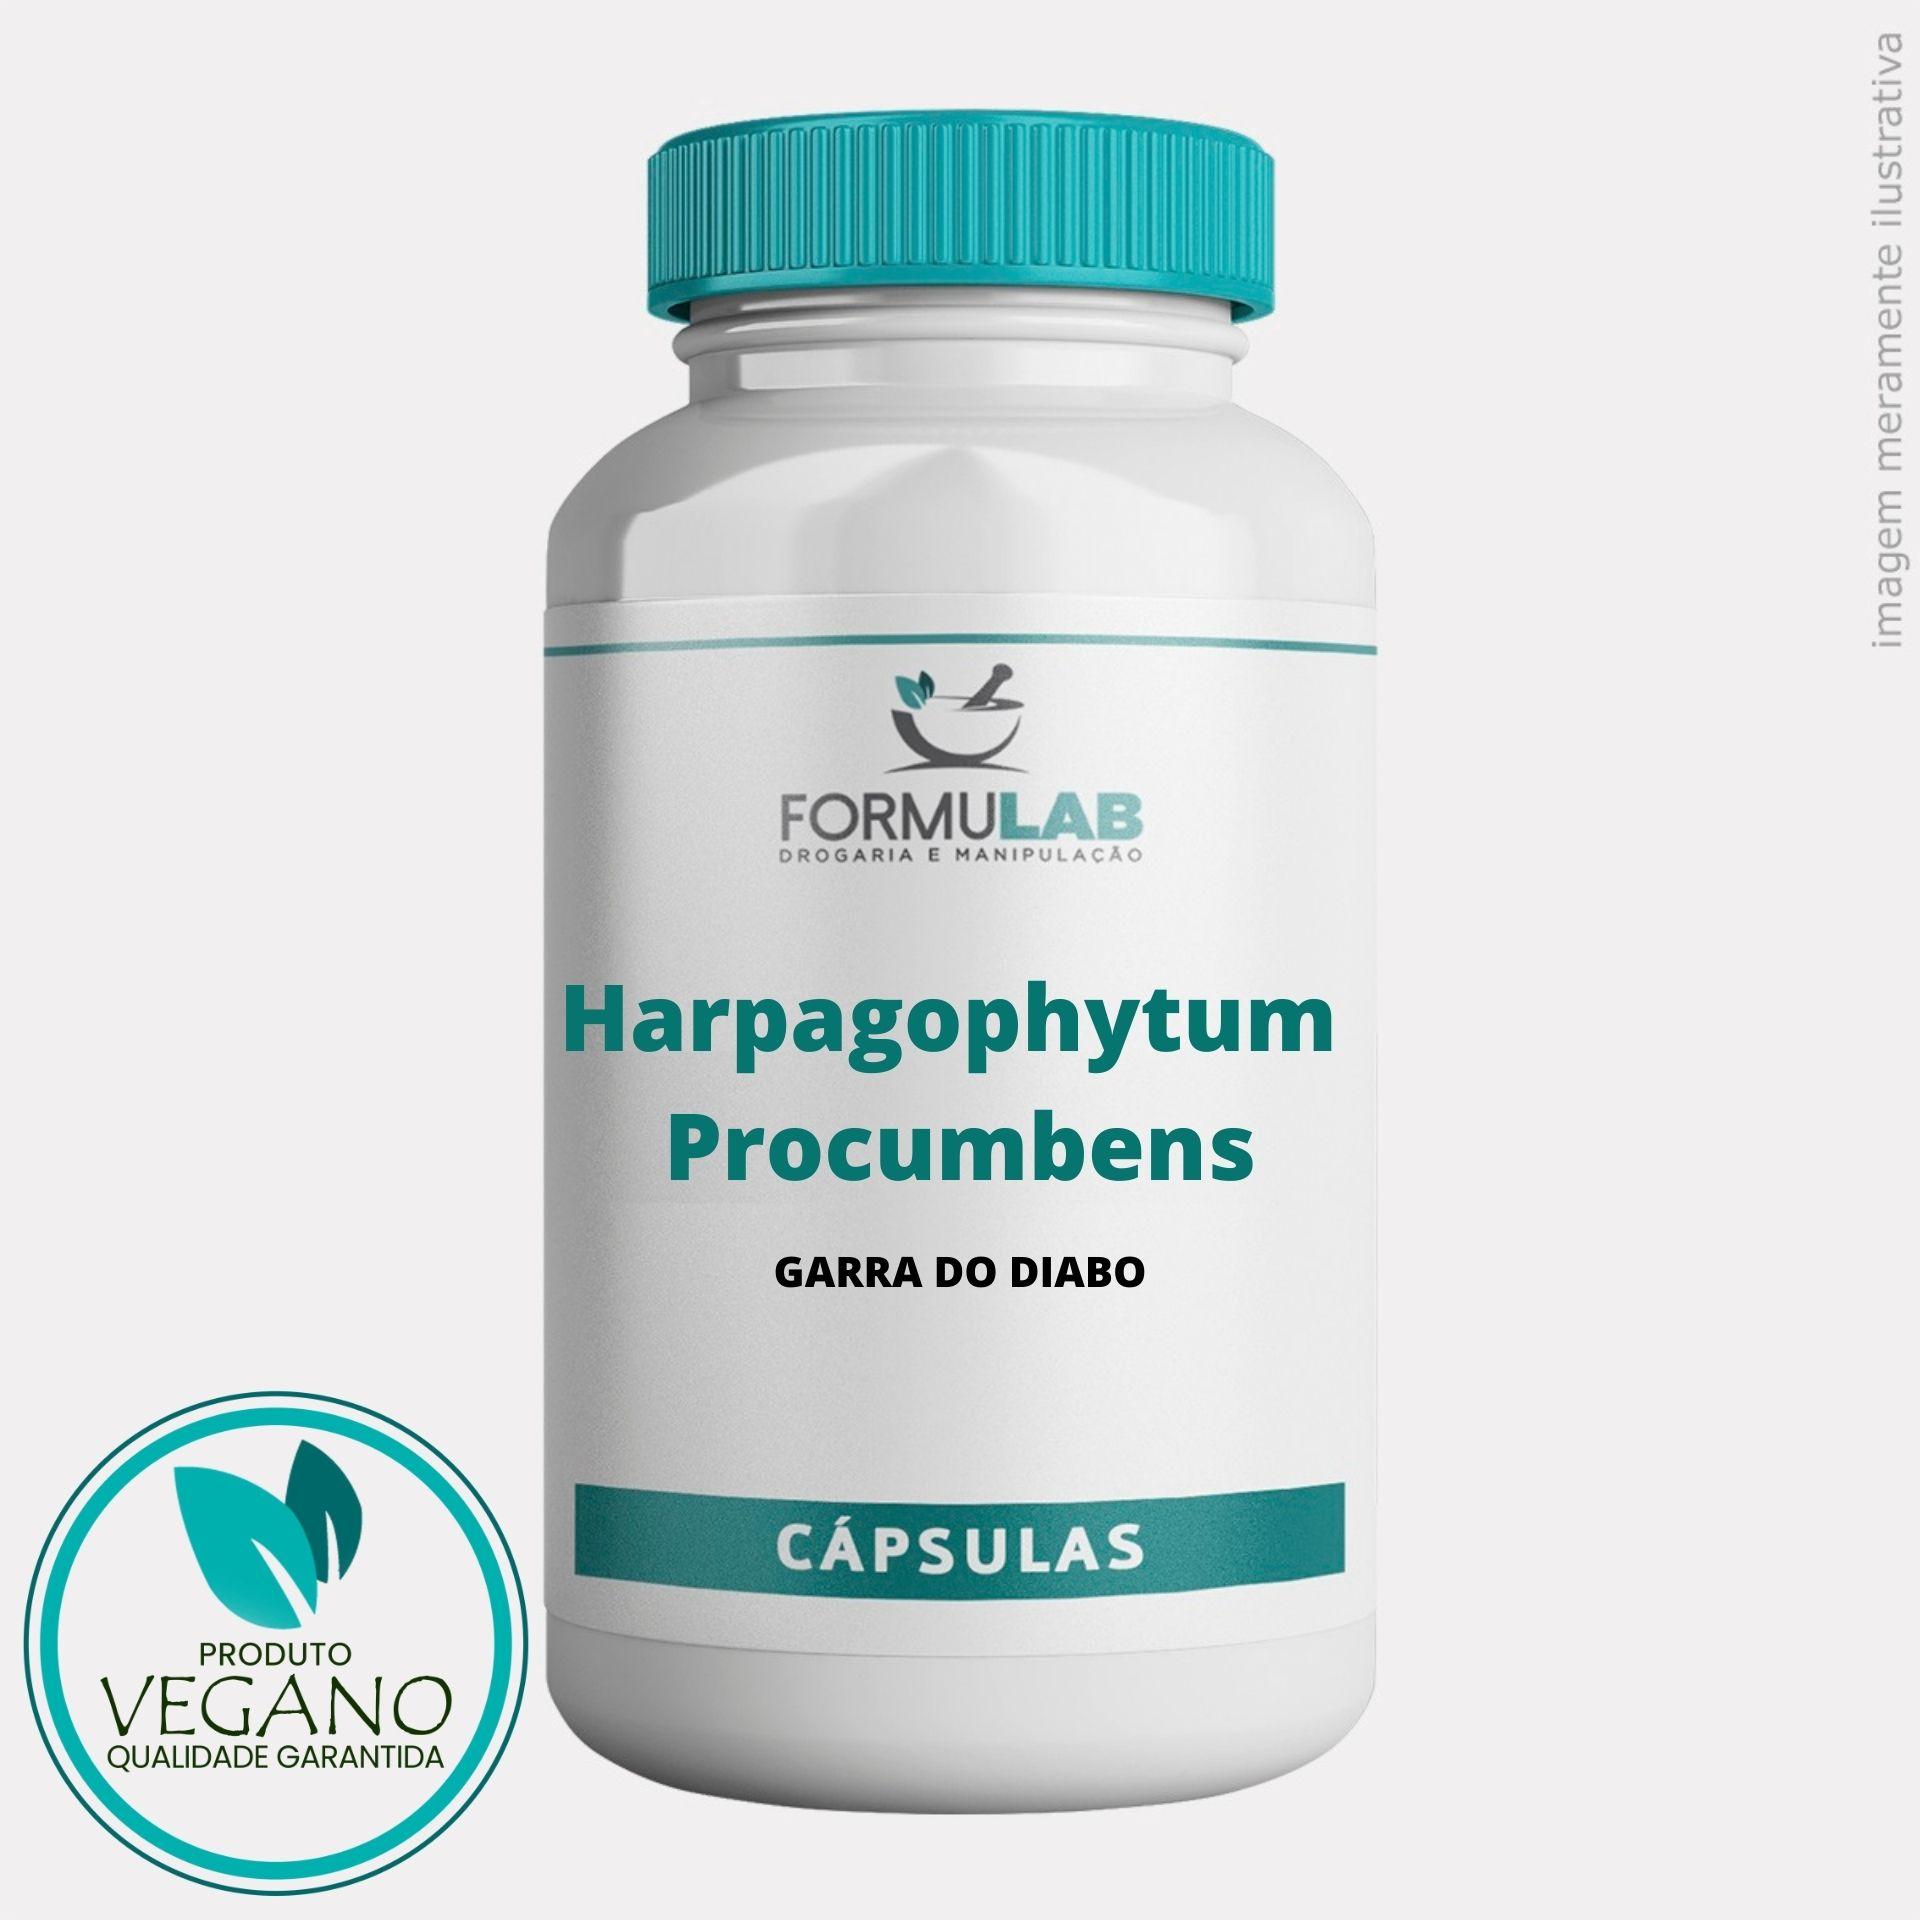 Harpagophytum Procumbens 300mg - Garra do Diabo VEGANO